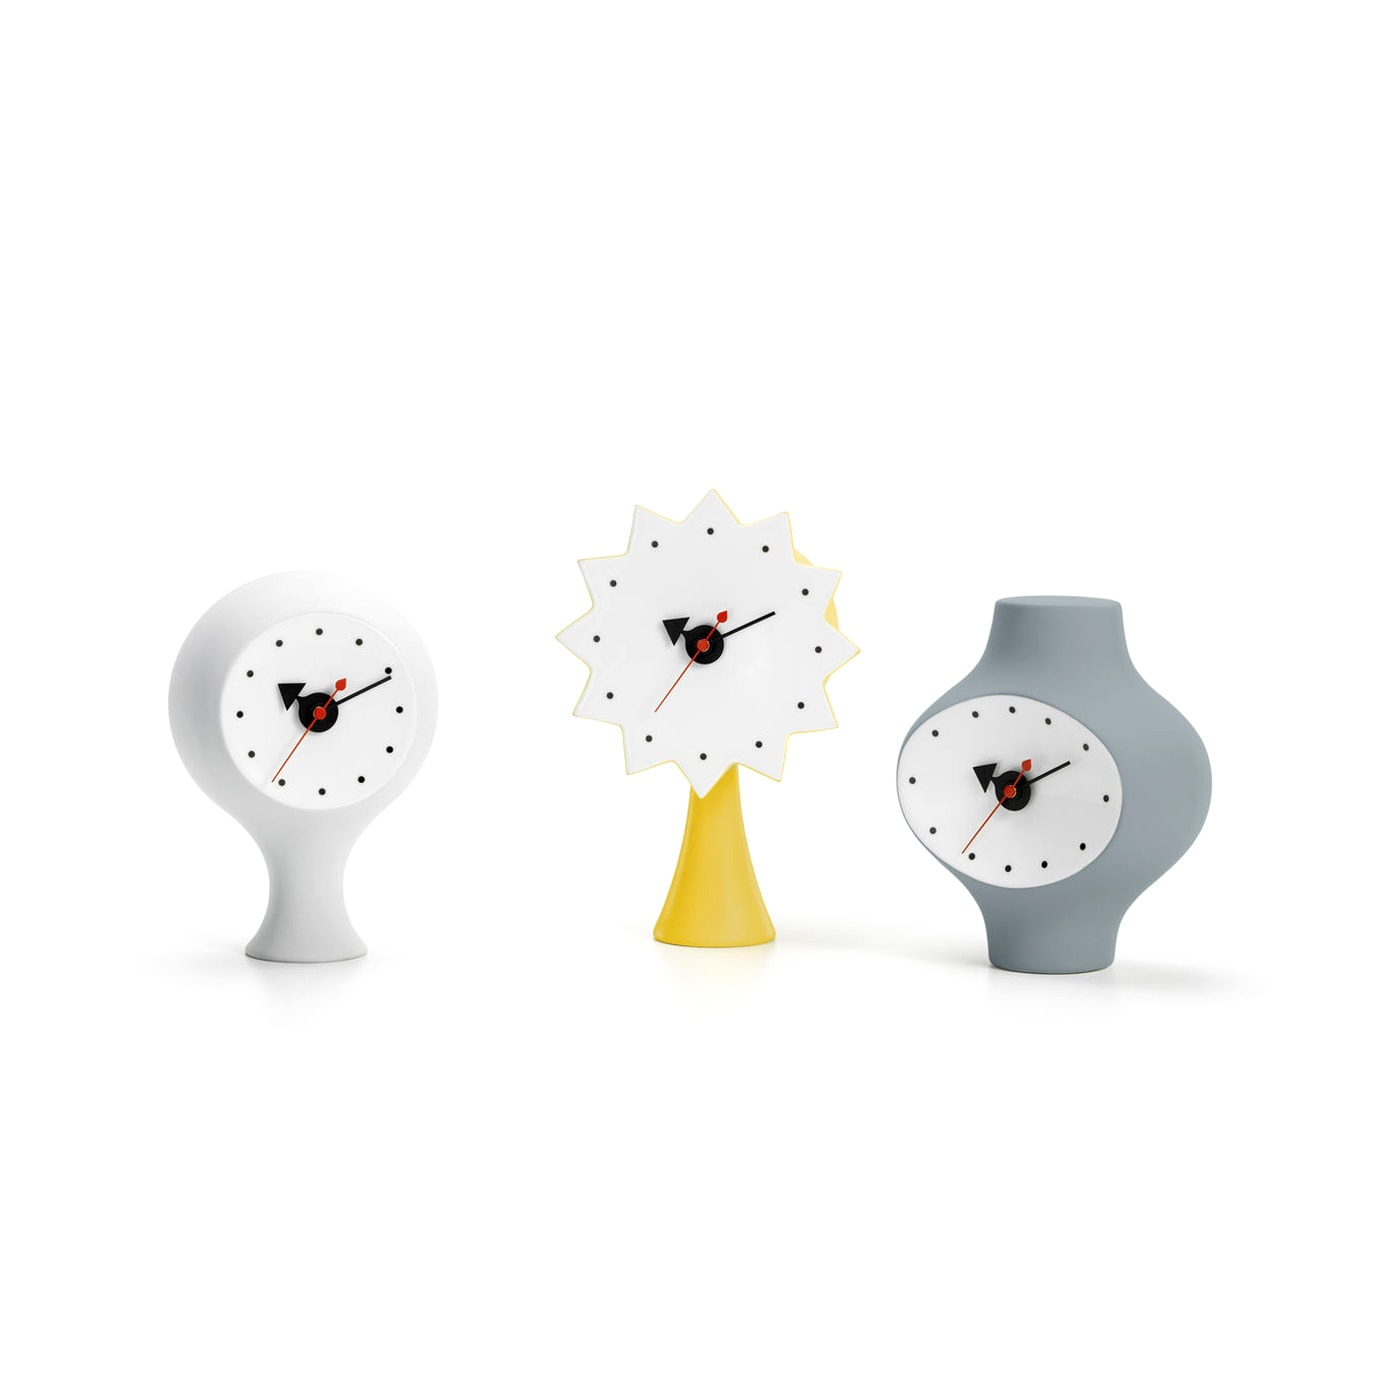 VITRA Ceramic Clocks orlogio tavolo